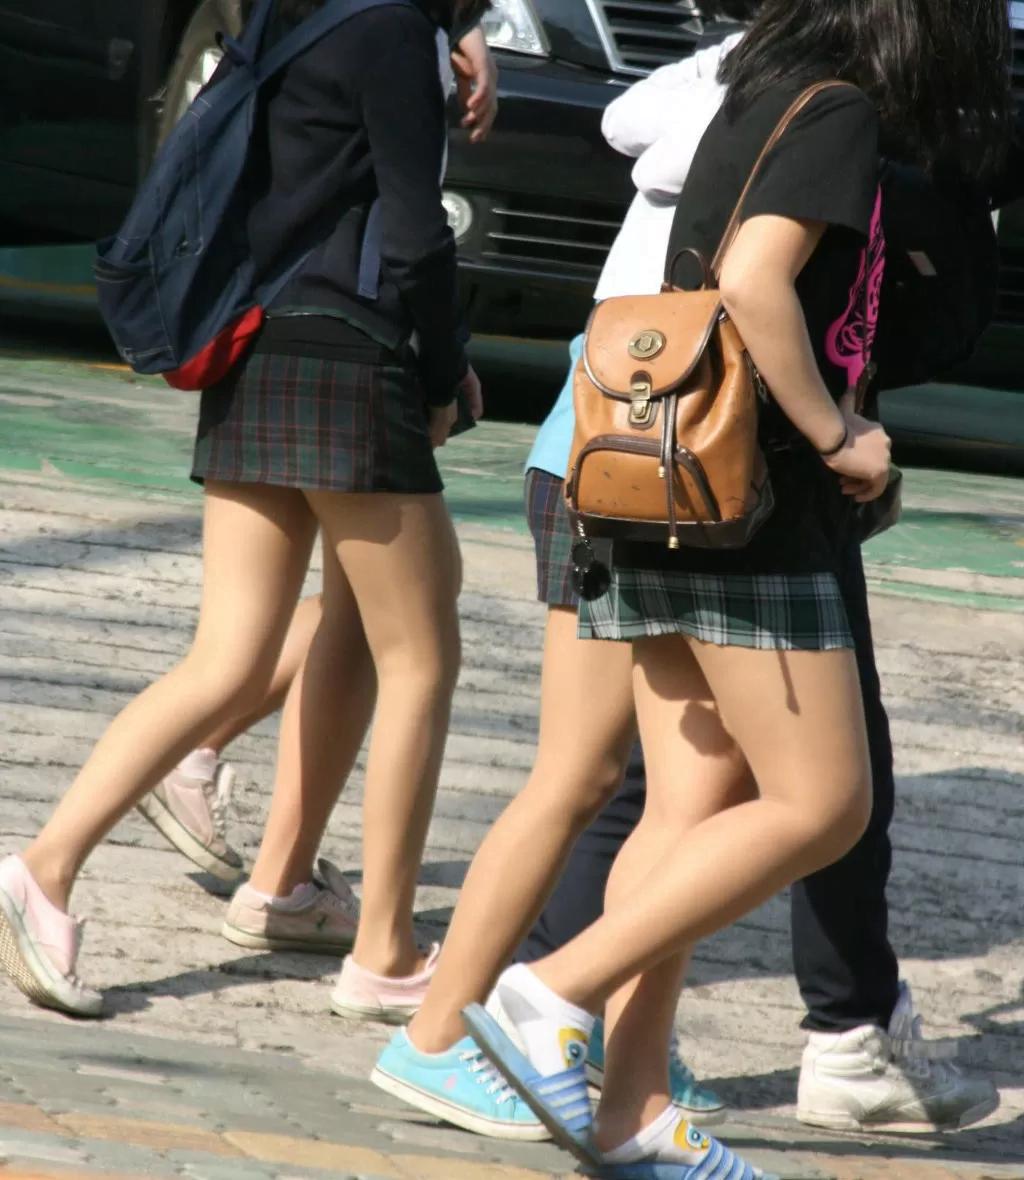 img 5fa6478e8fddd - 【画像】君は韓国JKのエロさを知ってるかい?